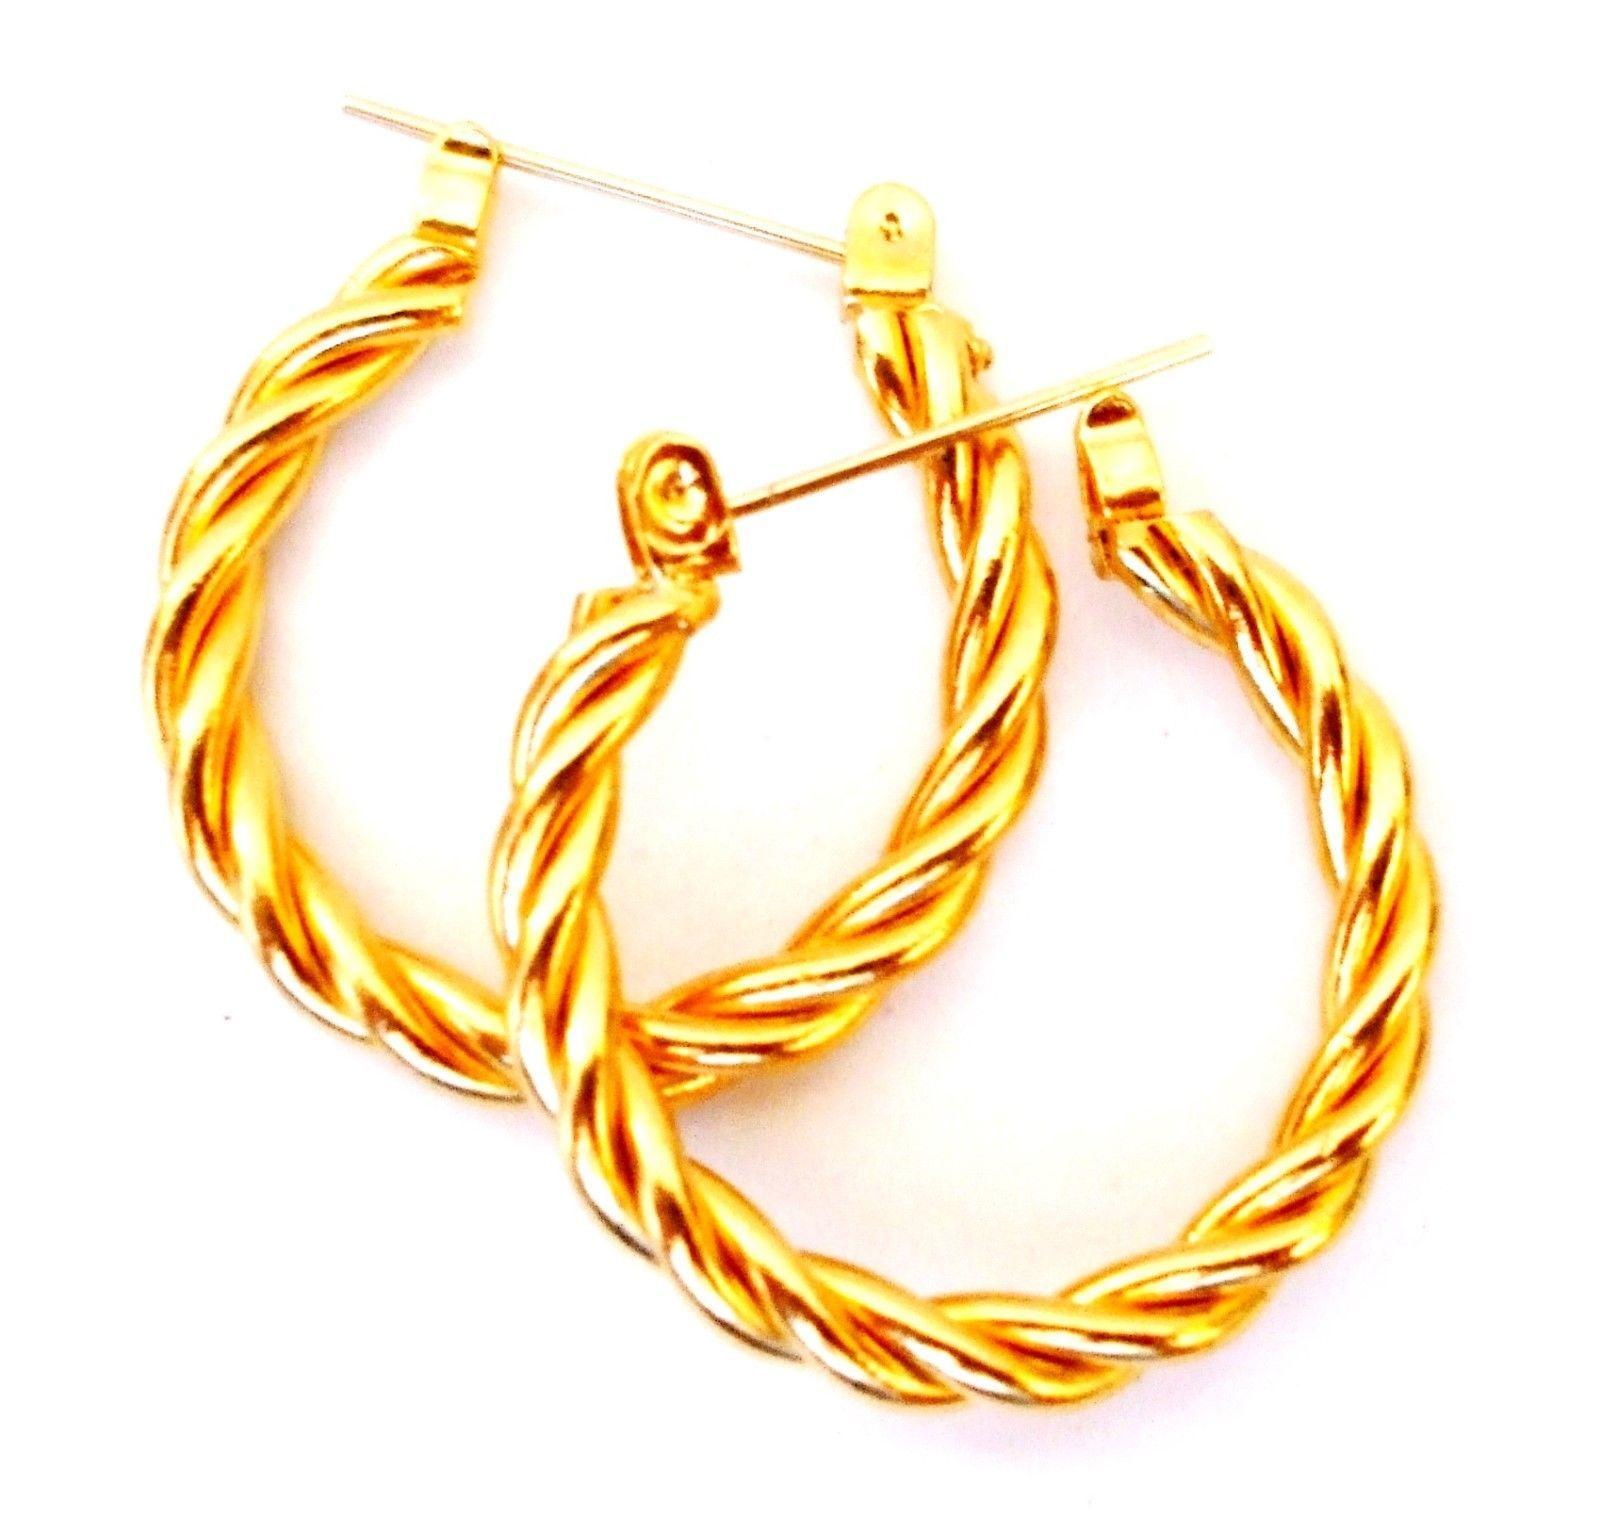 E147  VINTAGE LOOK 14K GOLD POST ROUND BRAIDED ONE INCH HOOP EARRINGS - $12.00